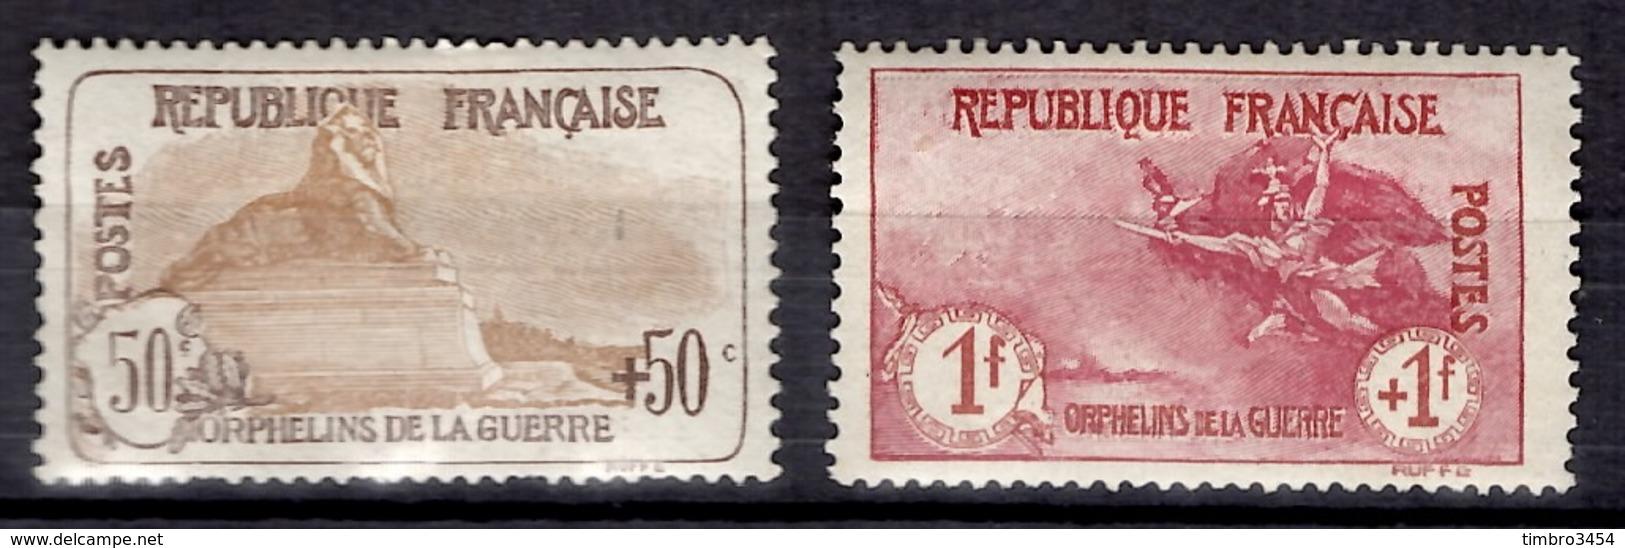 France Orphelins YT N° 153 Et 154 Neufs *. Gomme D'origine. B/TB. A Saisir! - France